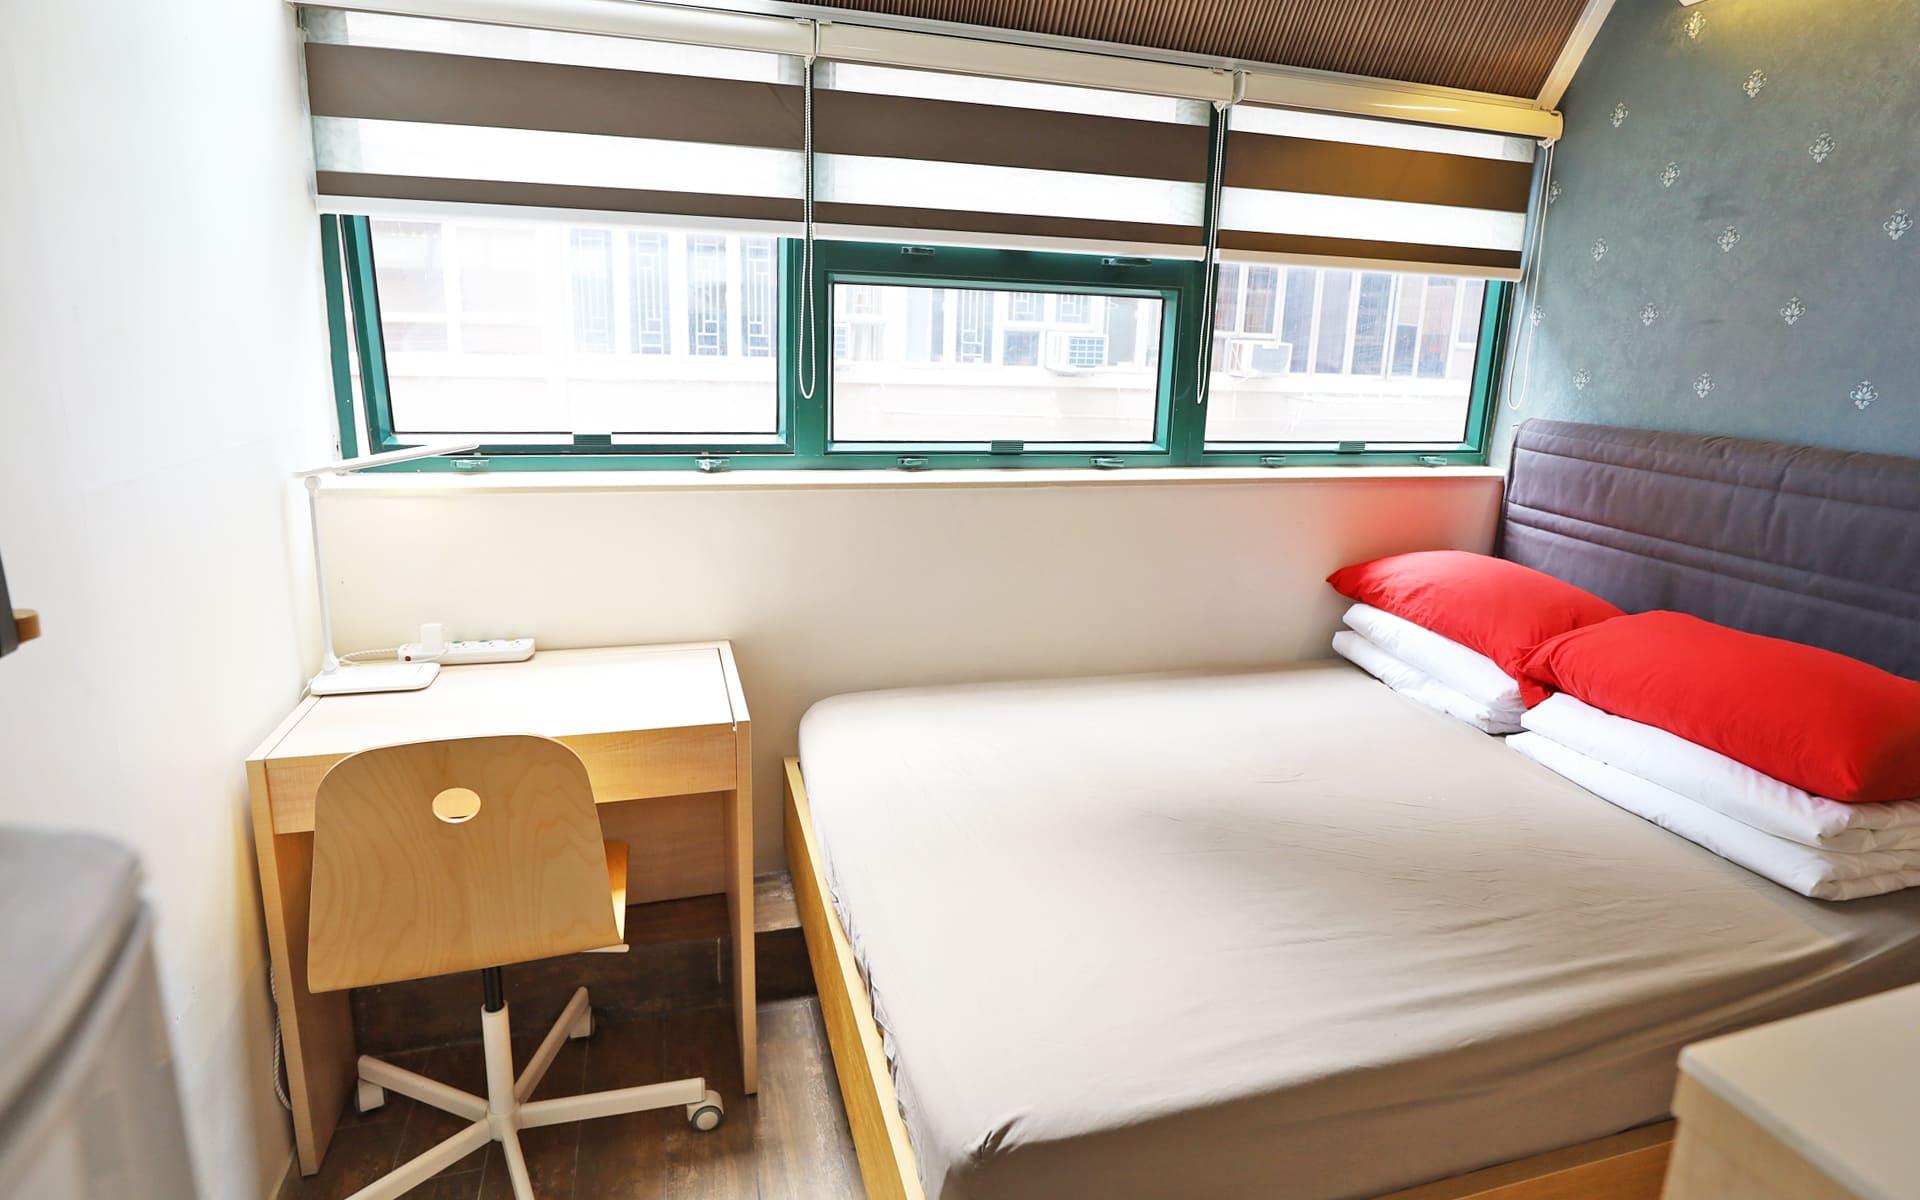 hk_service_apartment_14003318271591179359.jpg